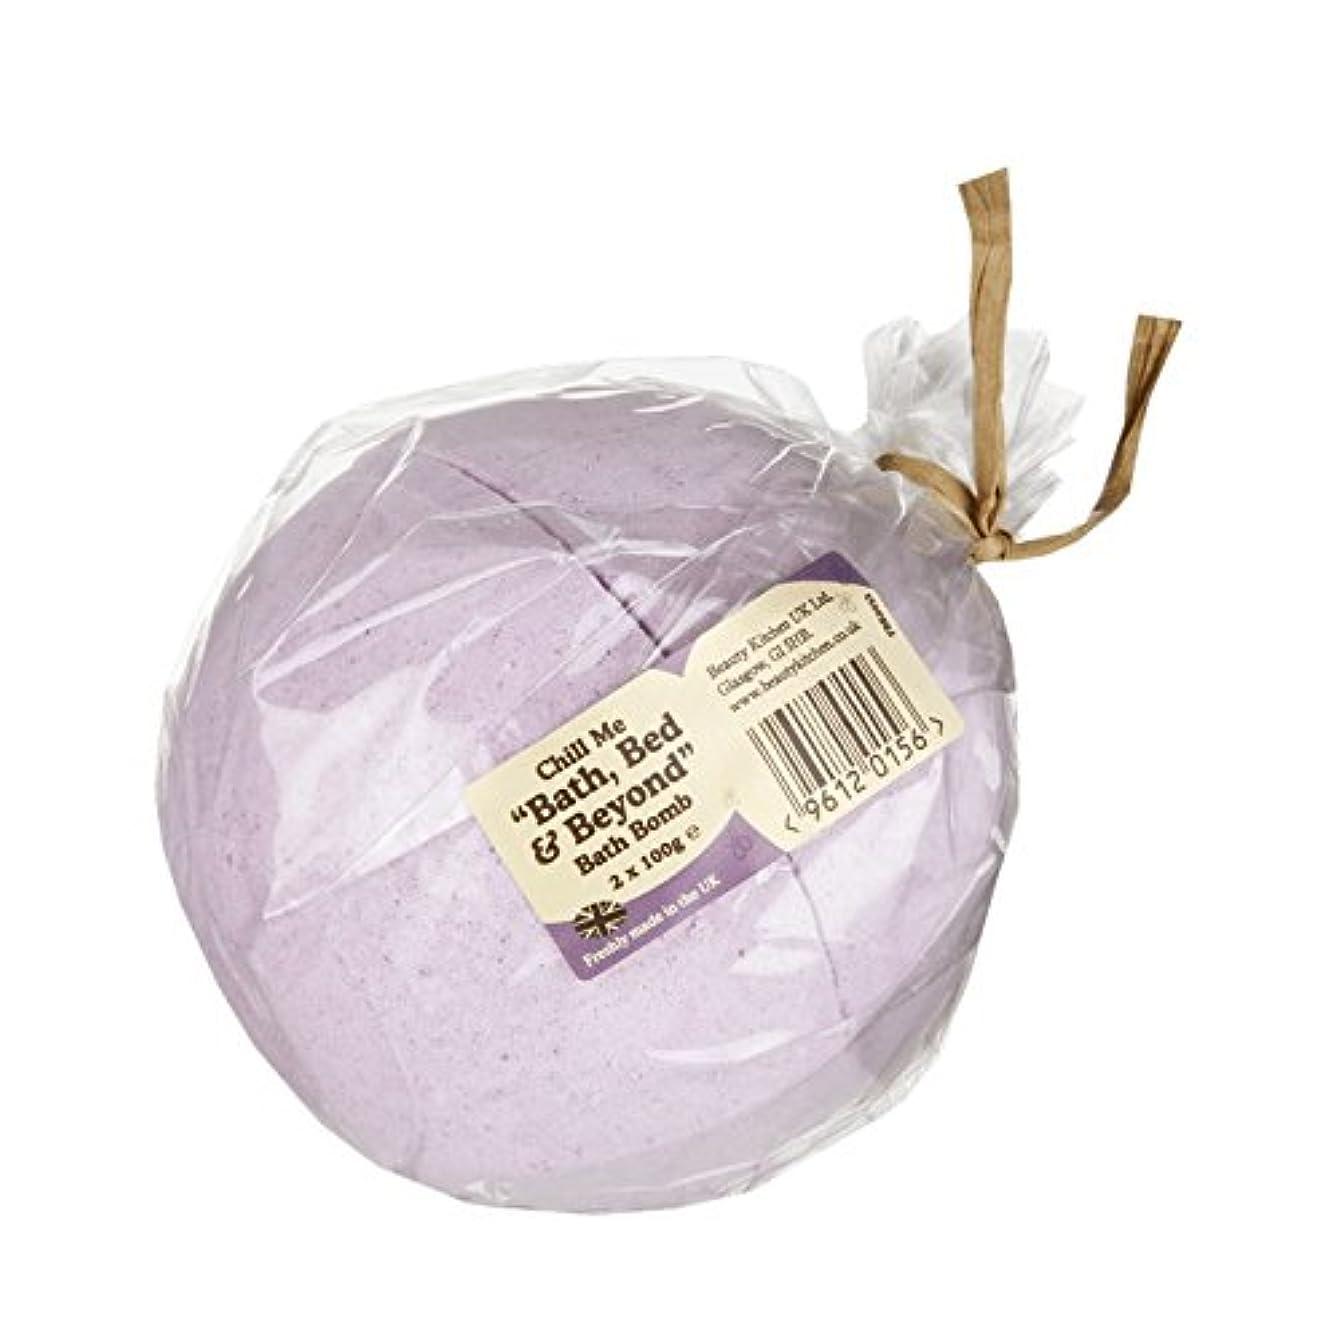 Beauty Kitchen Chill Me Bath, Bed & Beyond Bath Bomb 2 x 100g (Pack of 2) - 美しさのキッチンには、バスタブ、ベッド&バス爆弾2×100グラムを超...